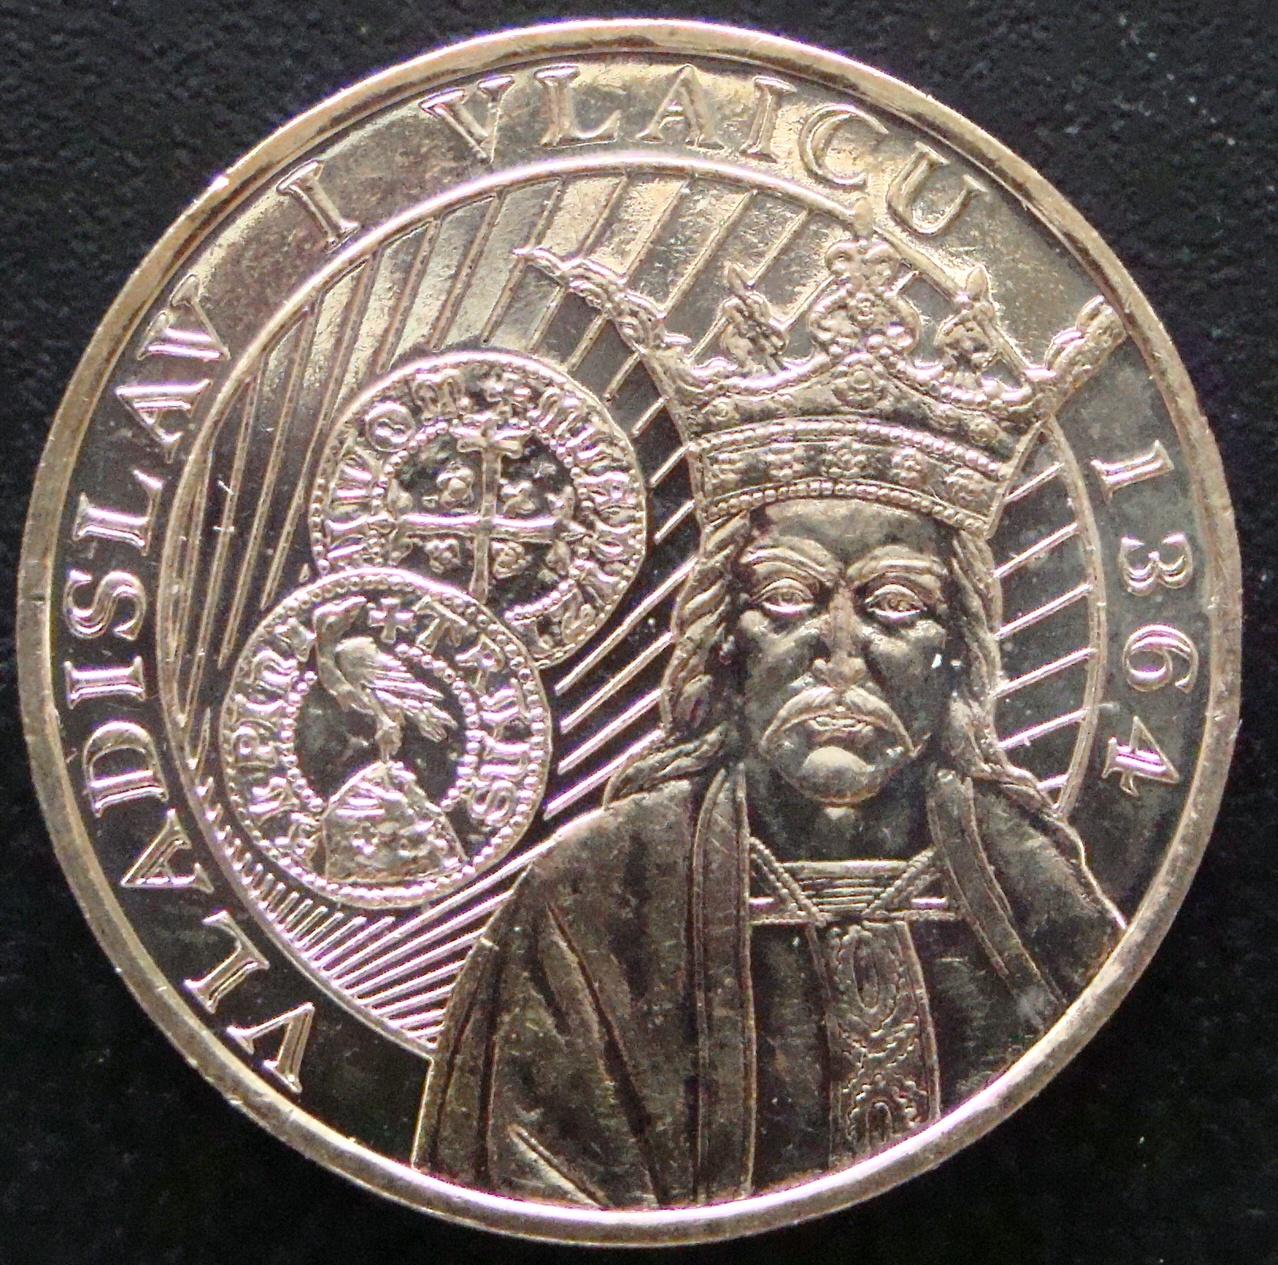 50 Bani. Rumania (2014) Vladislav  RUM_50_Bani_Vladislav_I_Vlaicu_rev